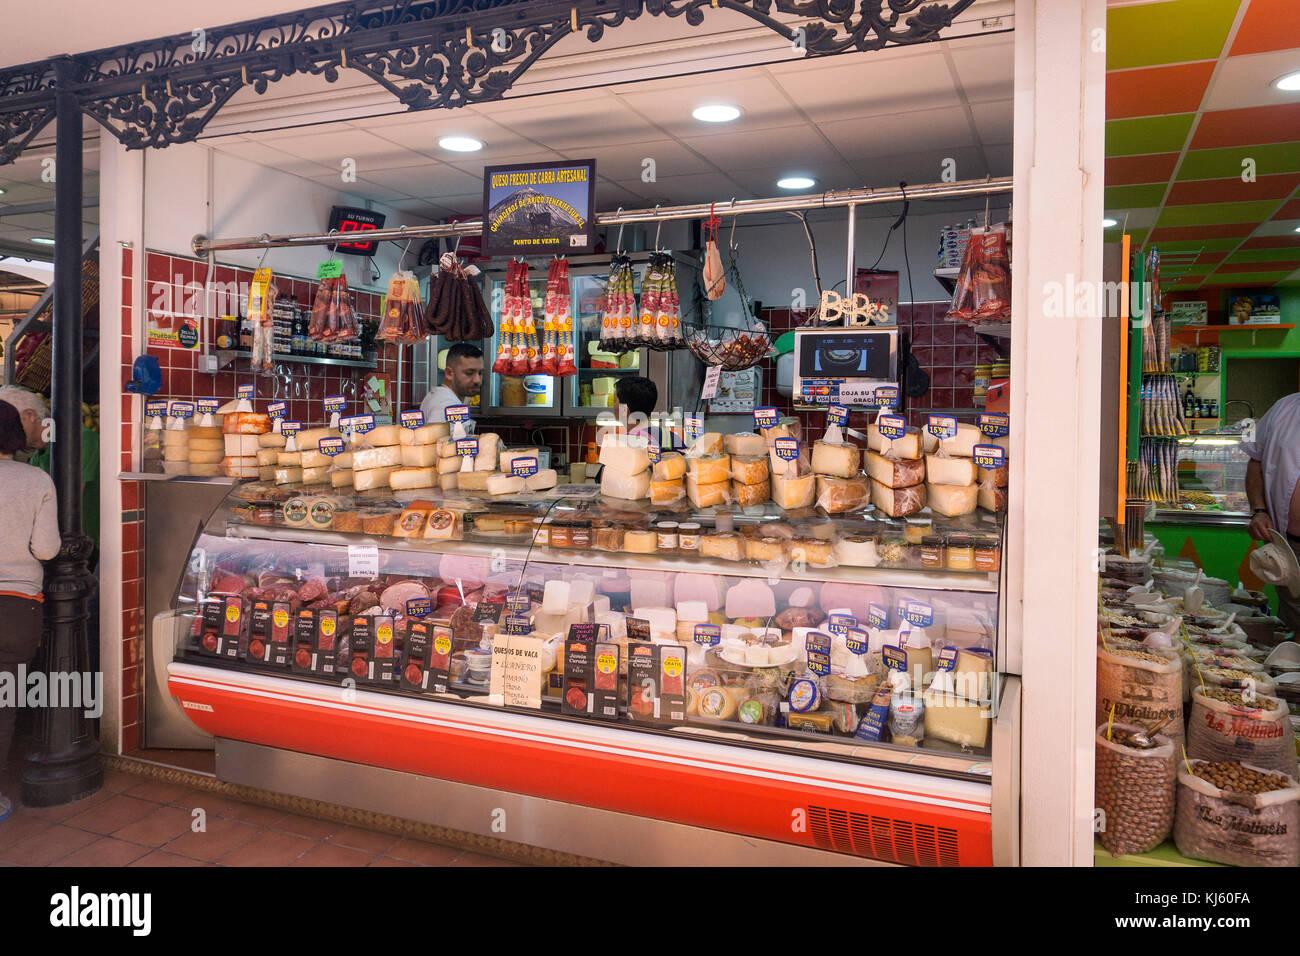 Kanarische Spezialitäten, Geschäfte im Mercado de Nuestra Señora de Africa, Stadt Markt in Santa Stockbild